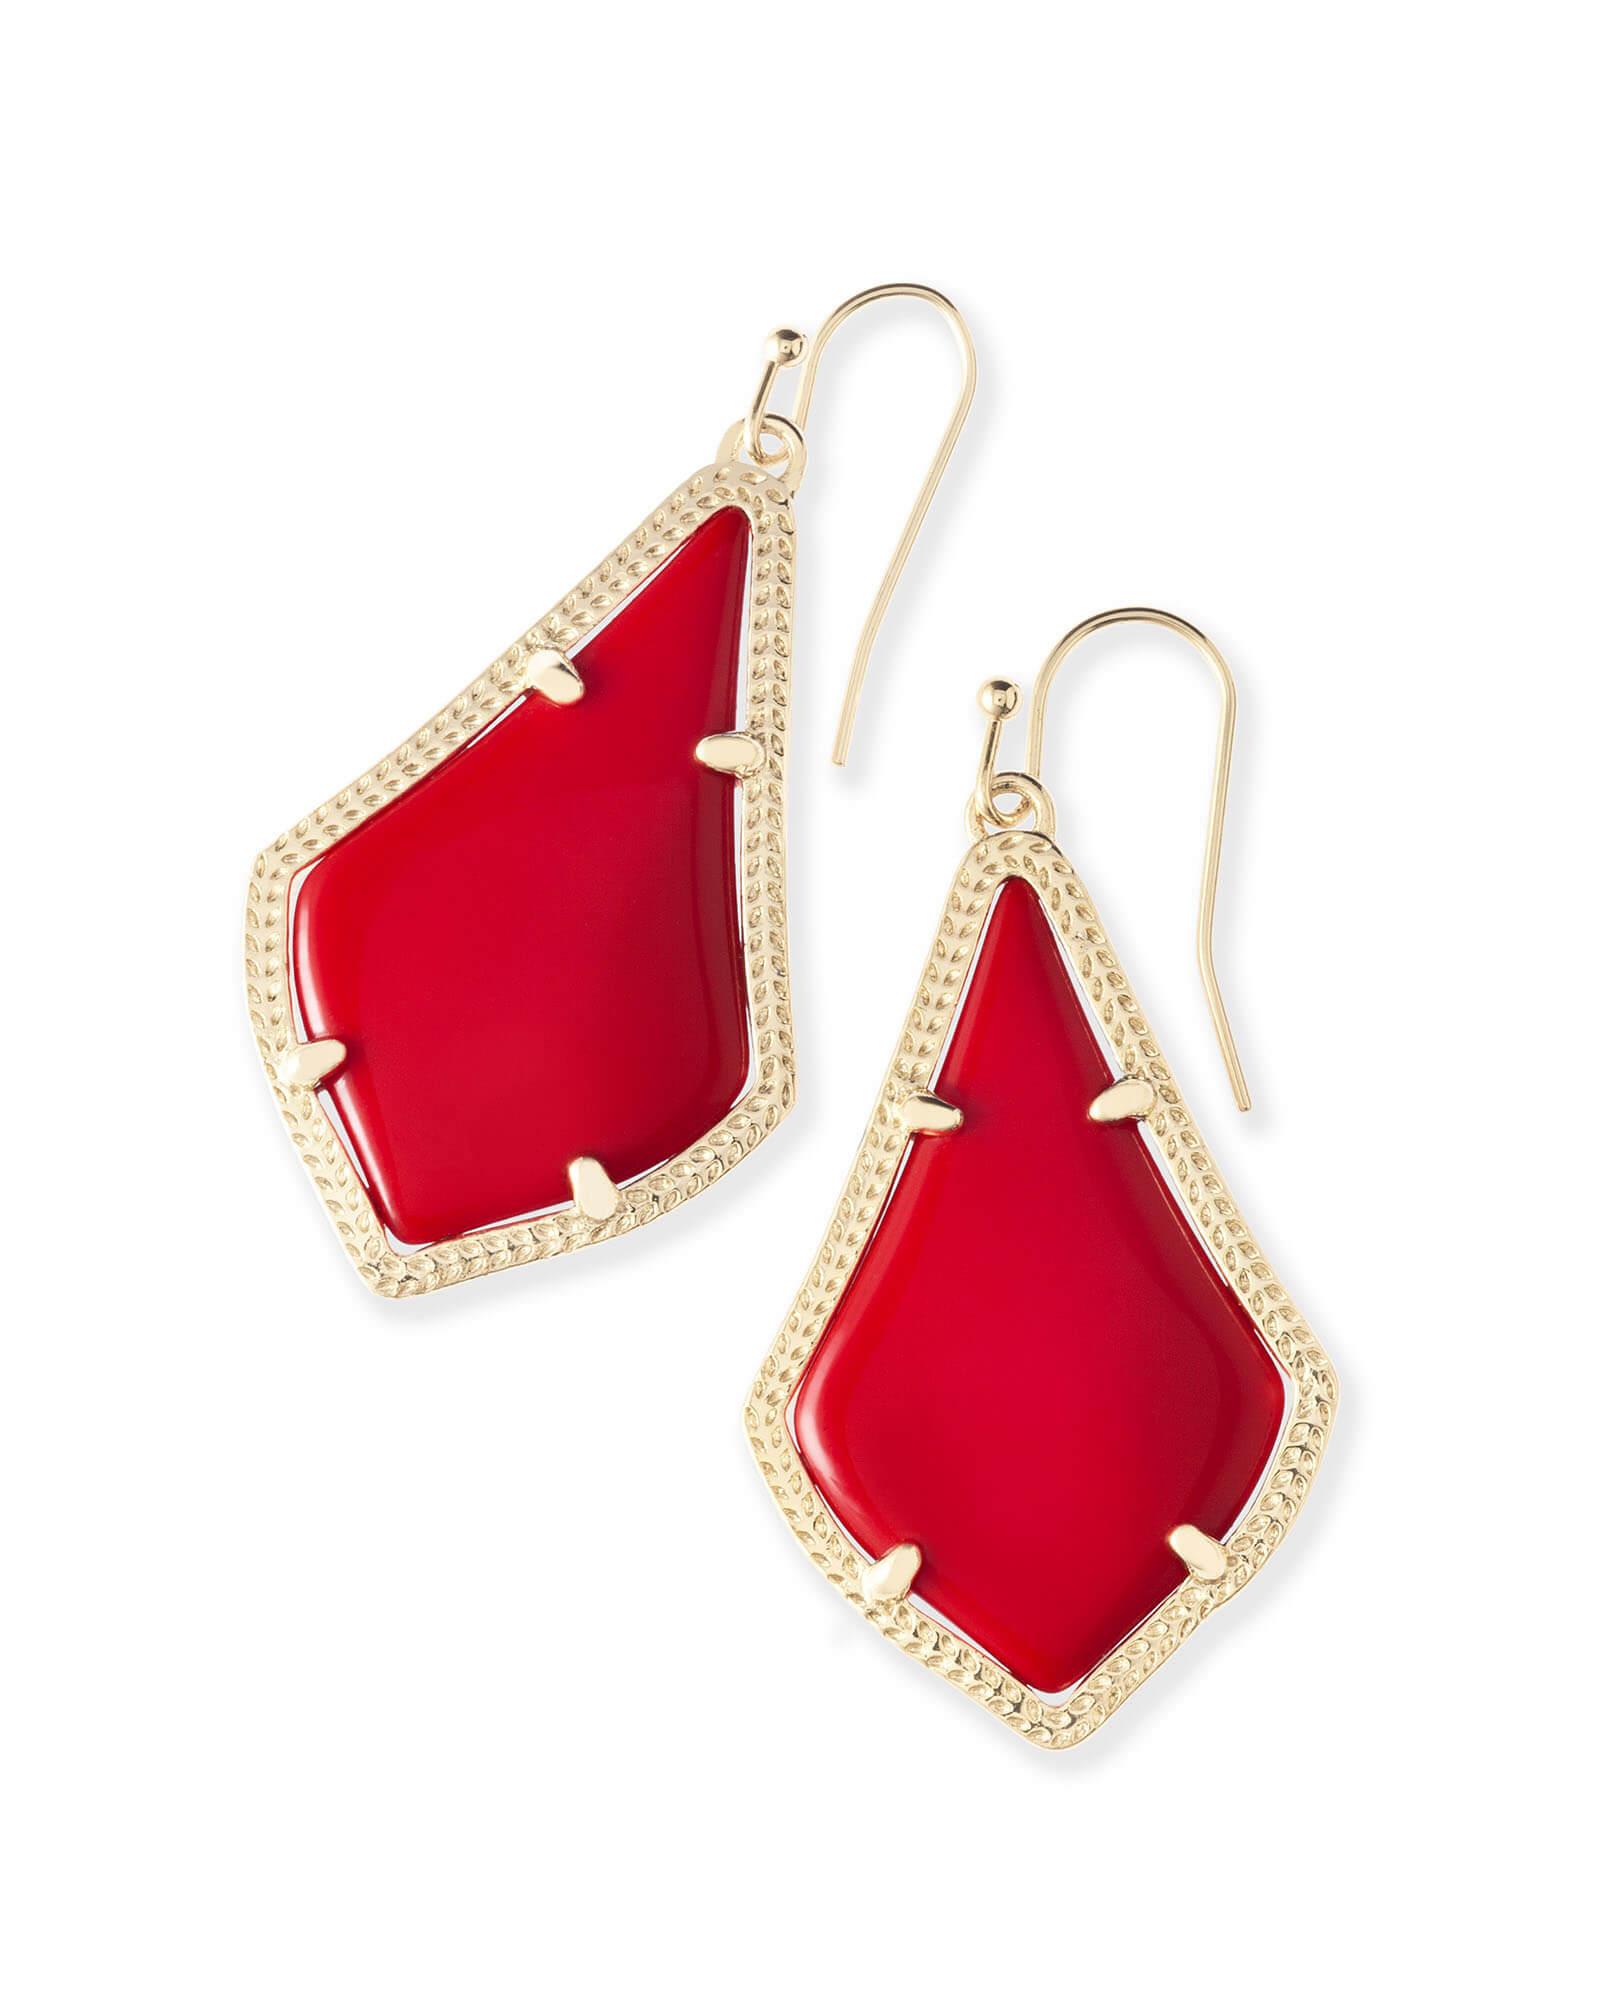 Alex Earrings In Bright Red